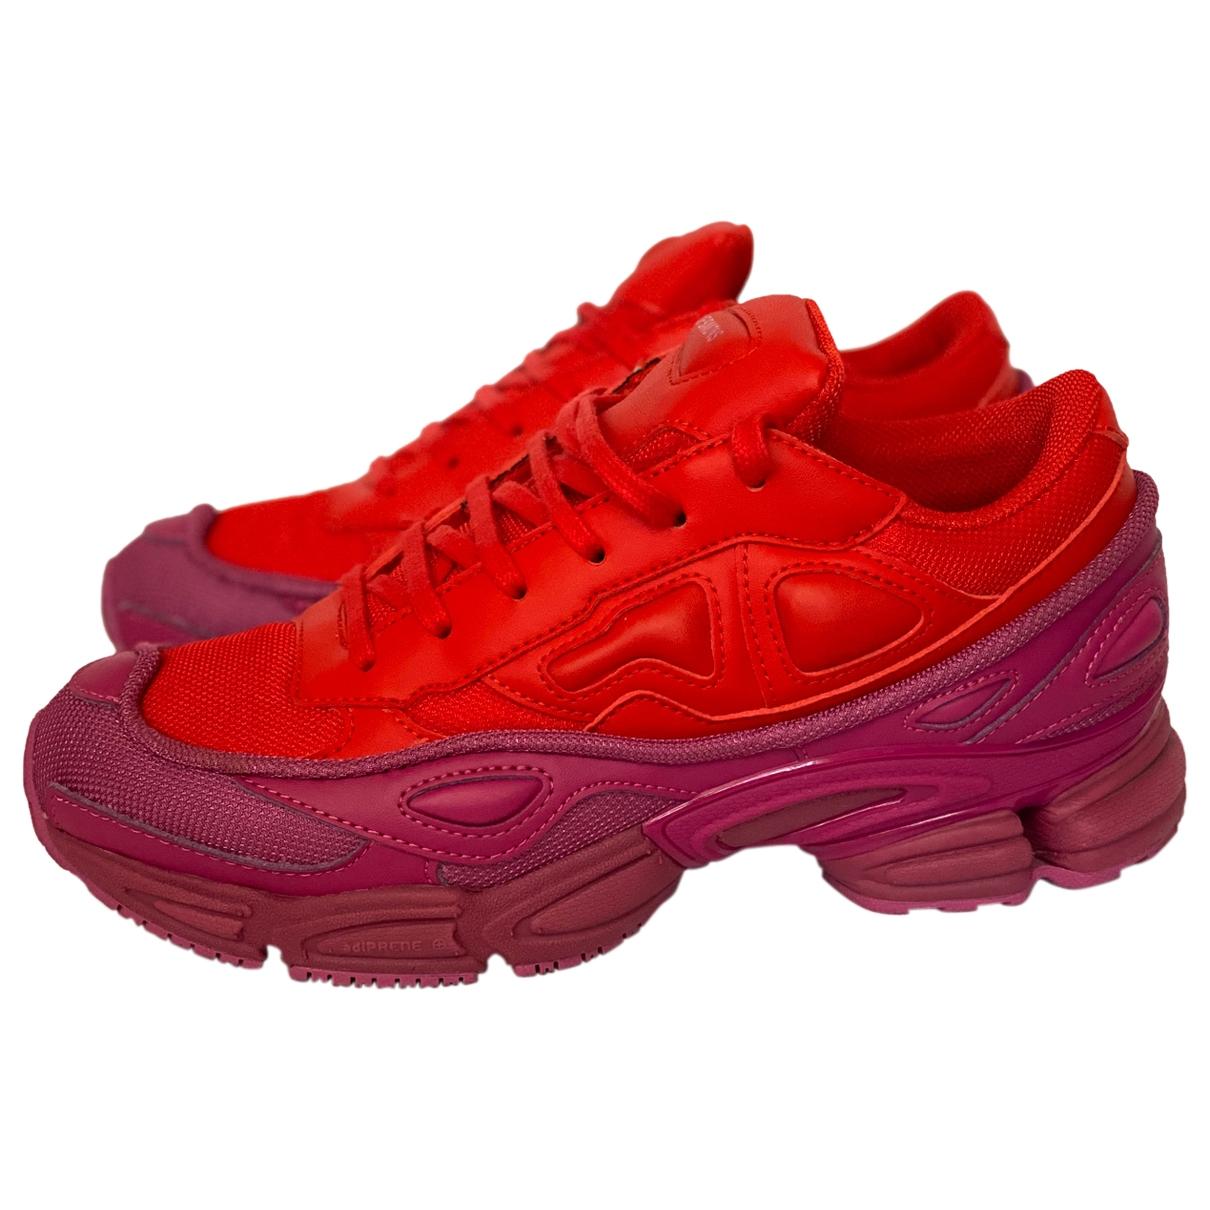 Adidas X Raf Simons Ozweego 2 Red Cloth Trainers for Women 38 EU